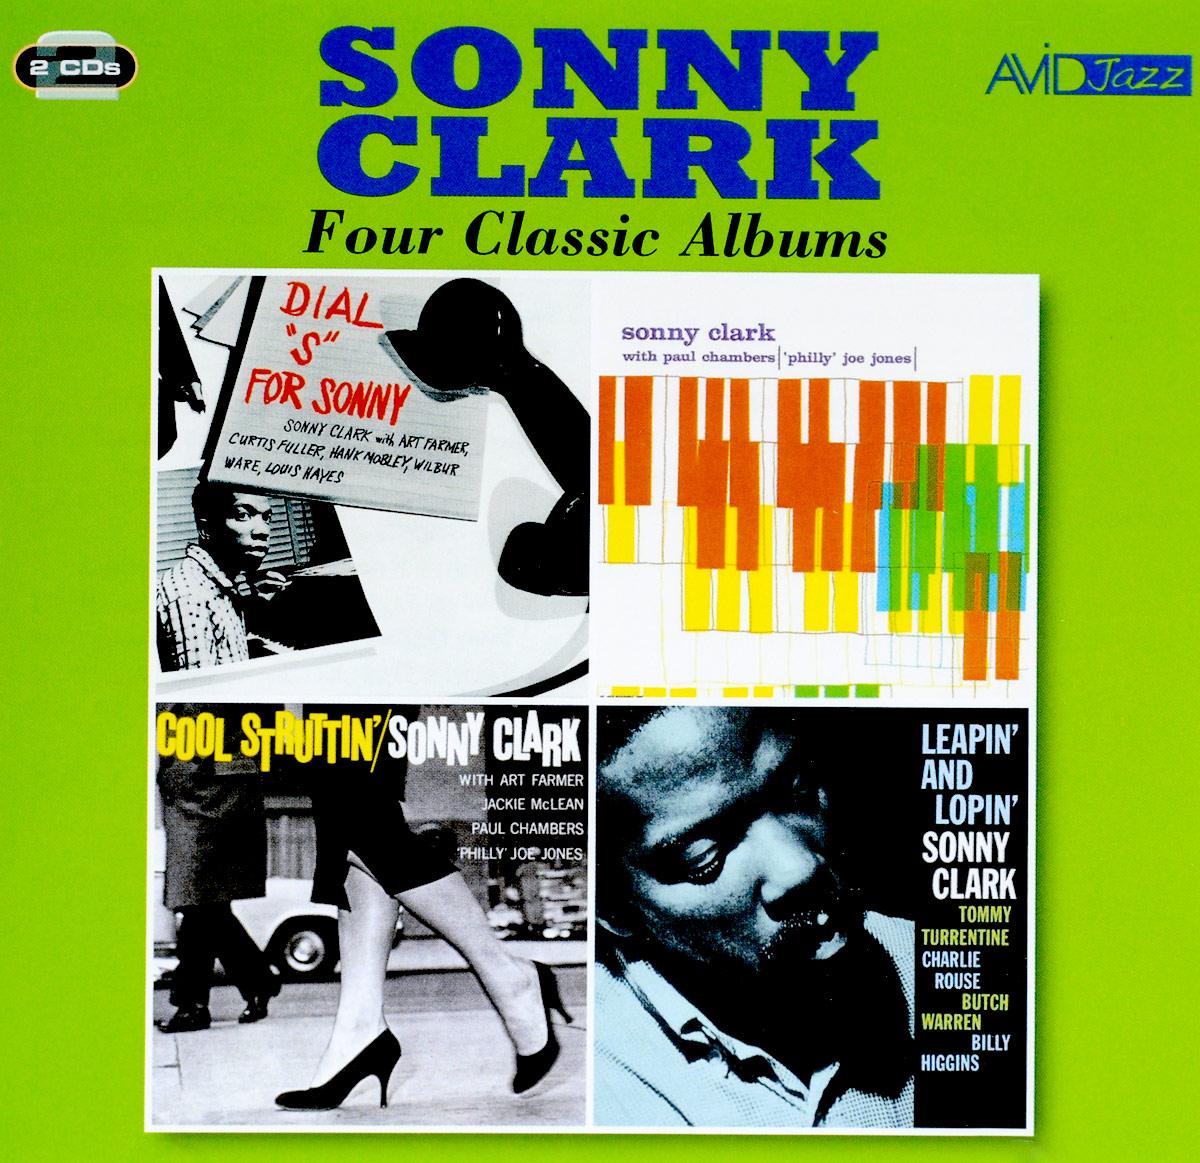 Сонни Кларк Sonny Clark. Four Classic Albums (2 CD) уинтон келли avid jazz wynton kelly four classic albums 2 cd